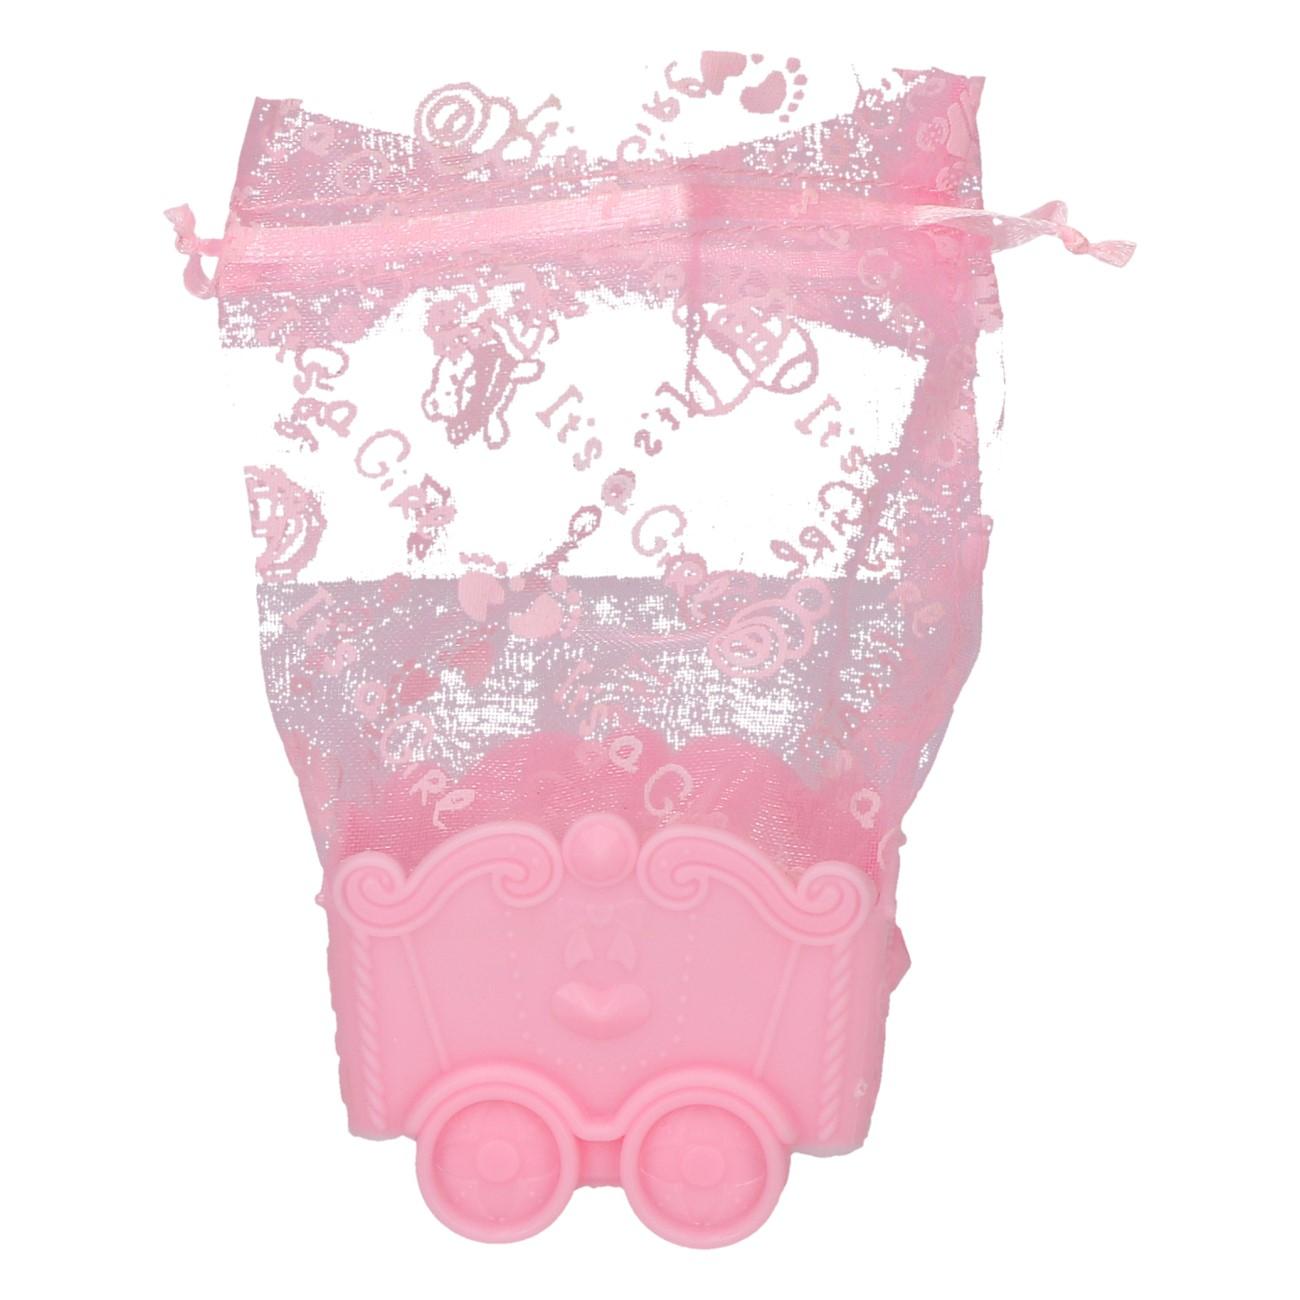 Kinderwagentje roze